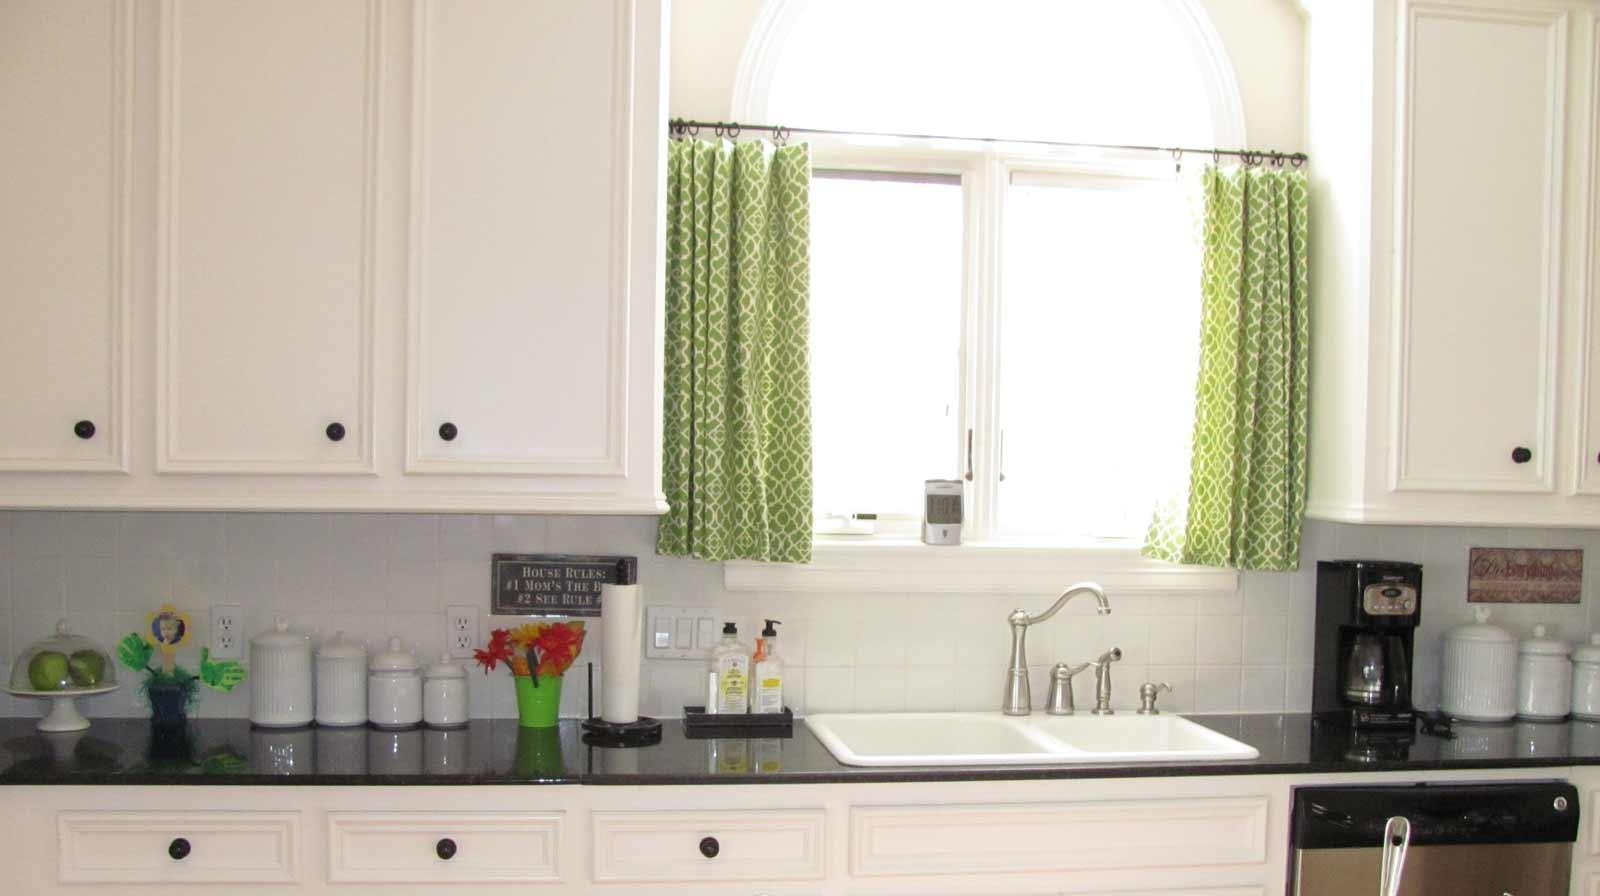 Cafe curtains bathroom - Kitchen Cafe Curtains Photo 7